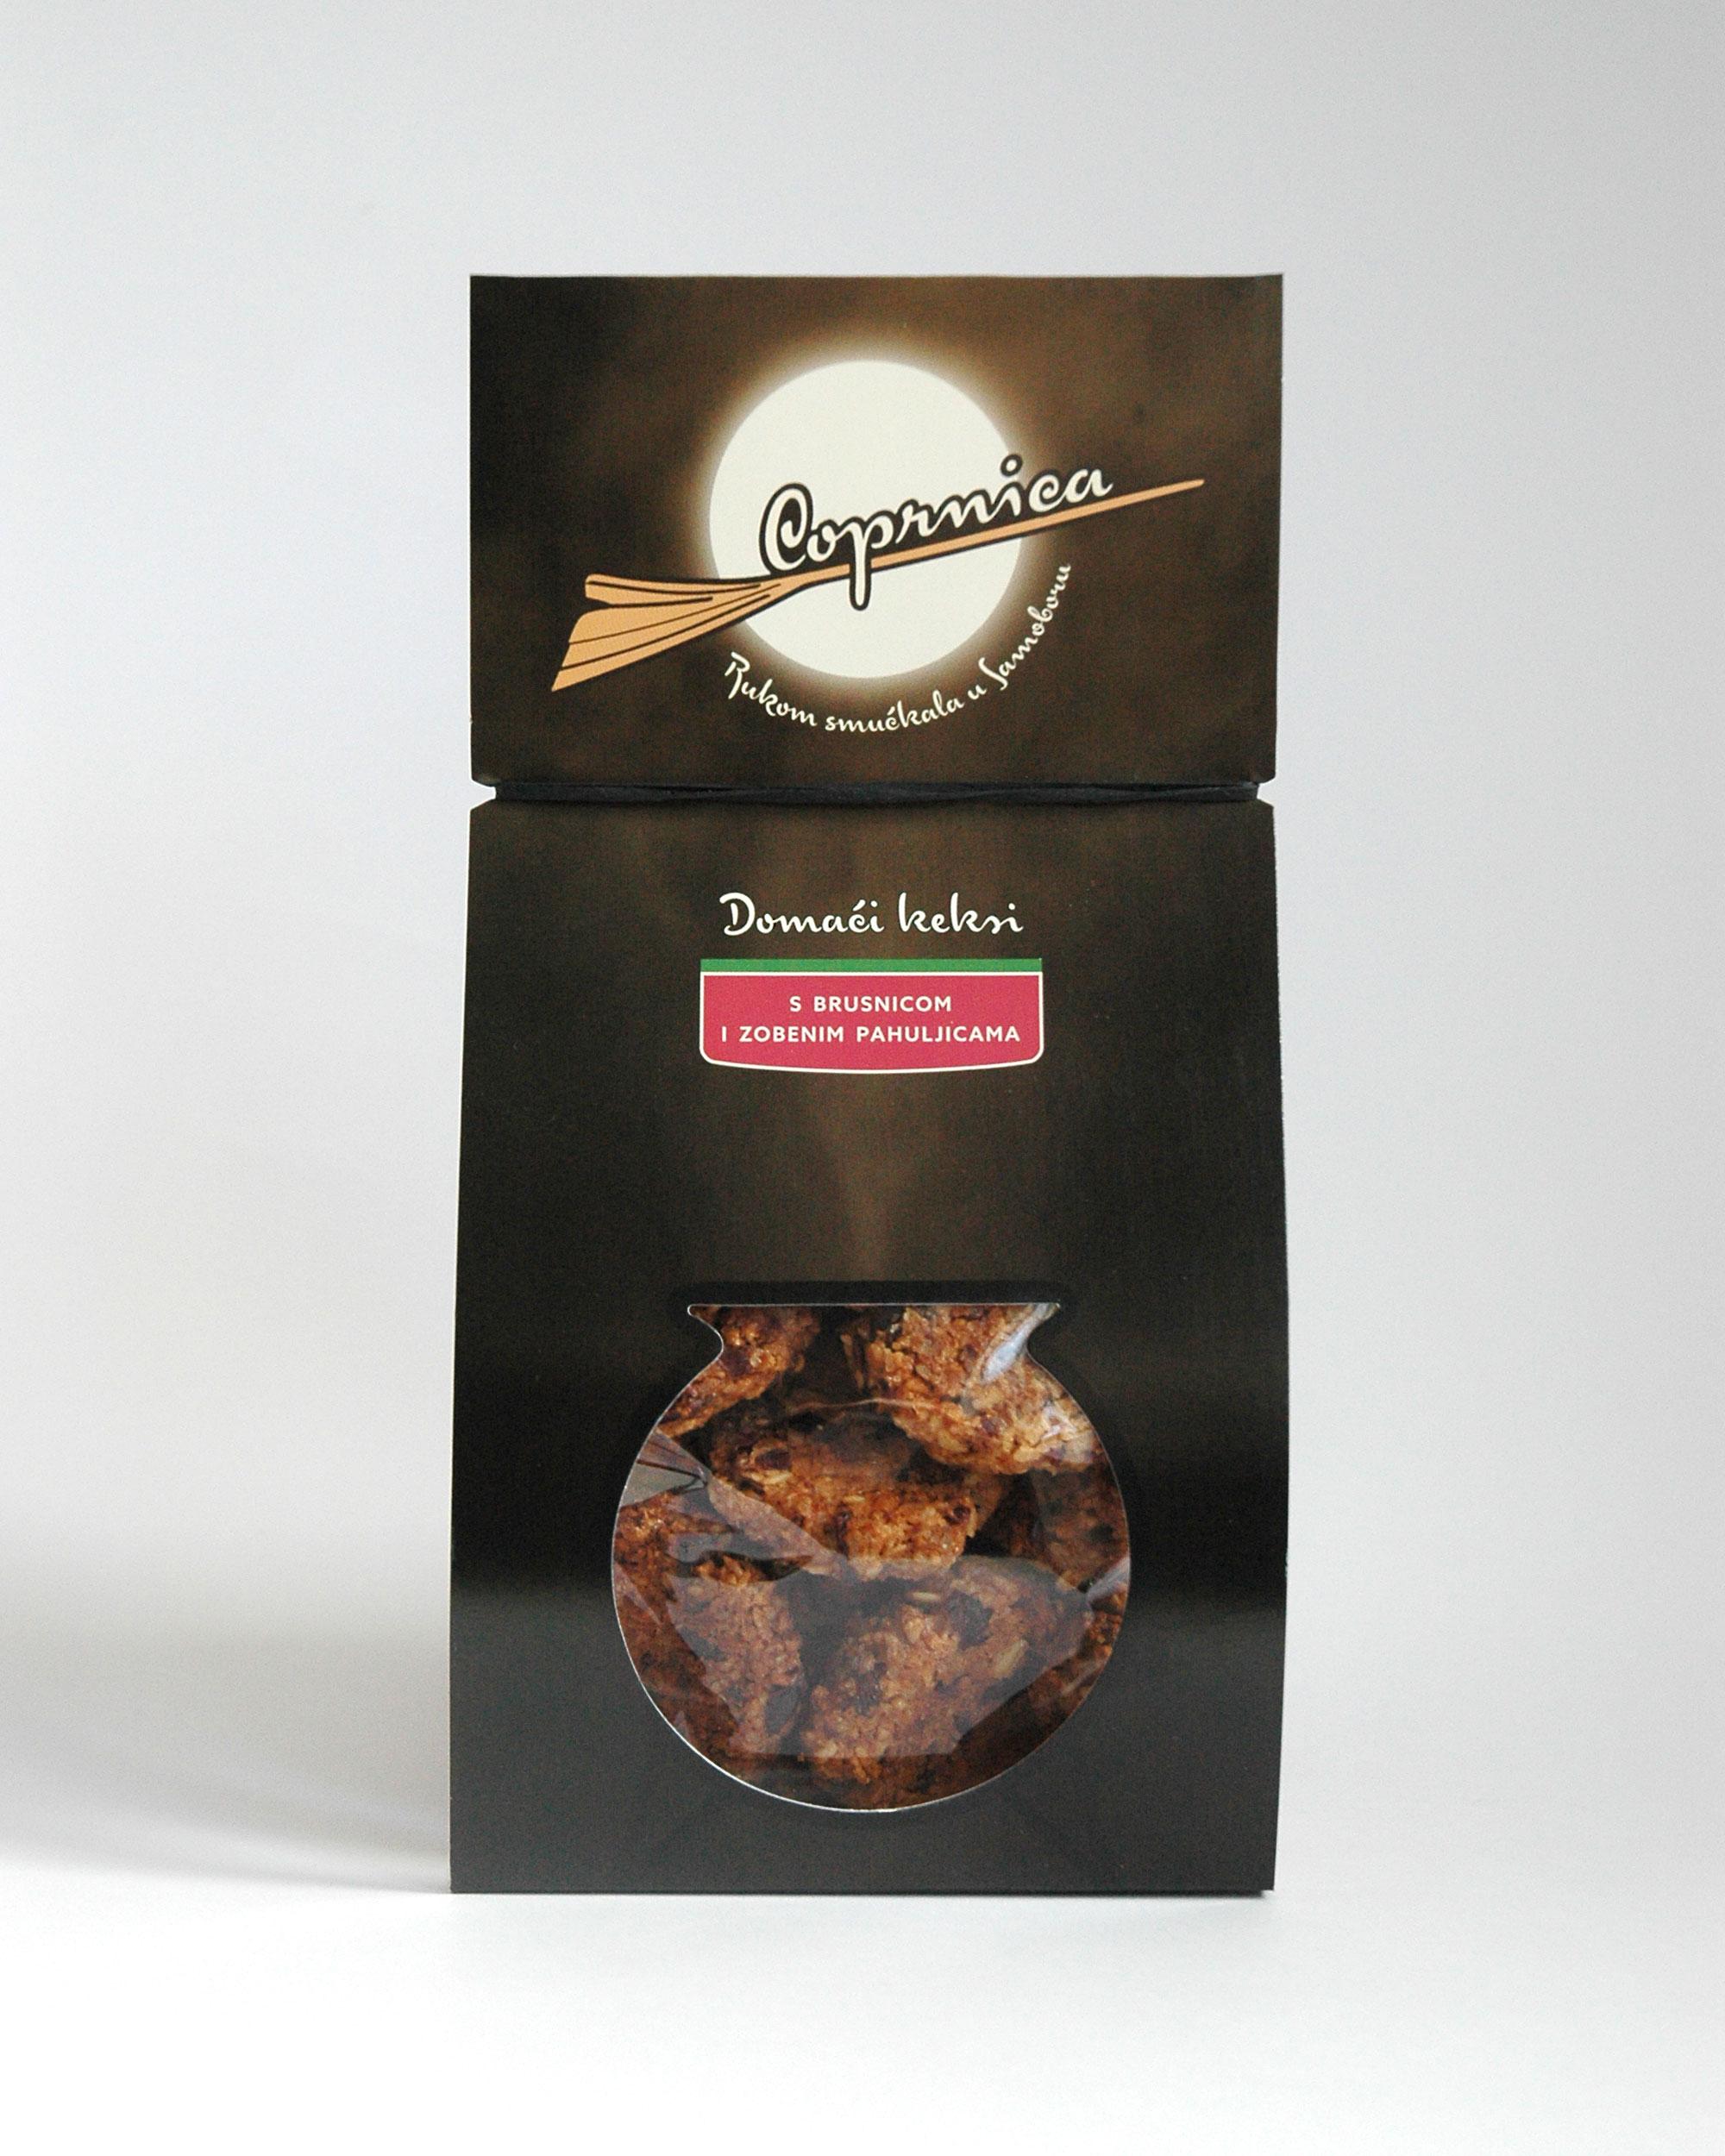 masavukmanovic.com - coprnica packaging 03